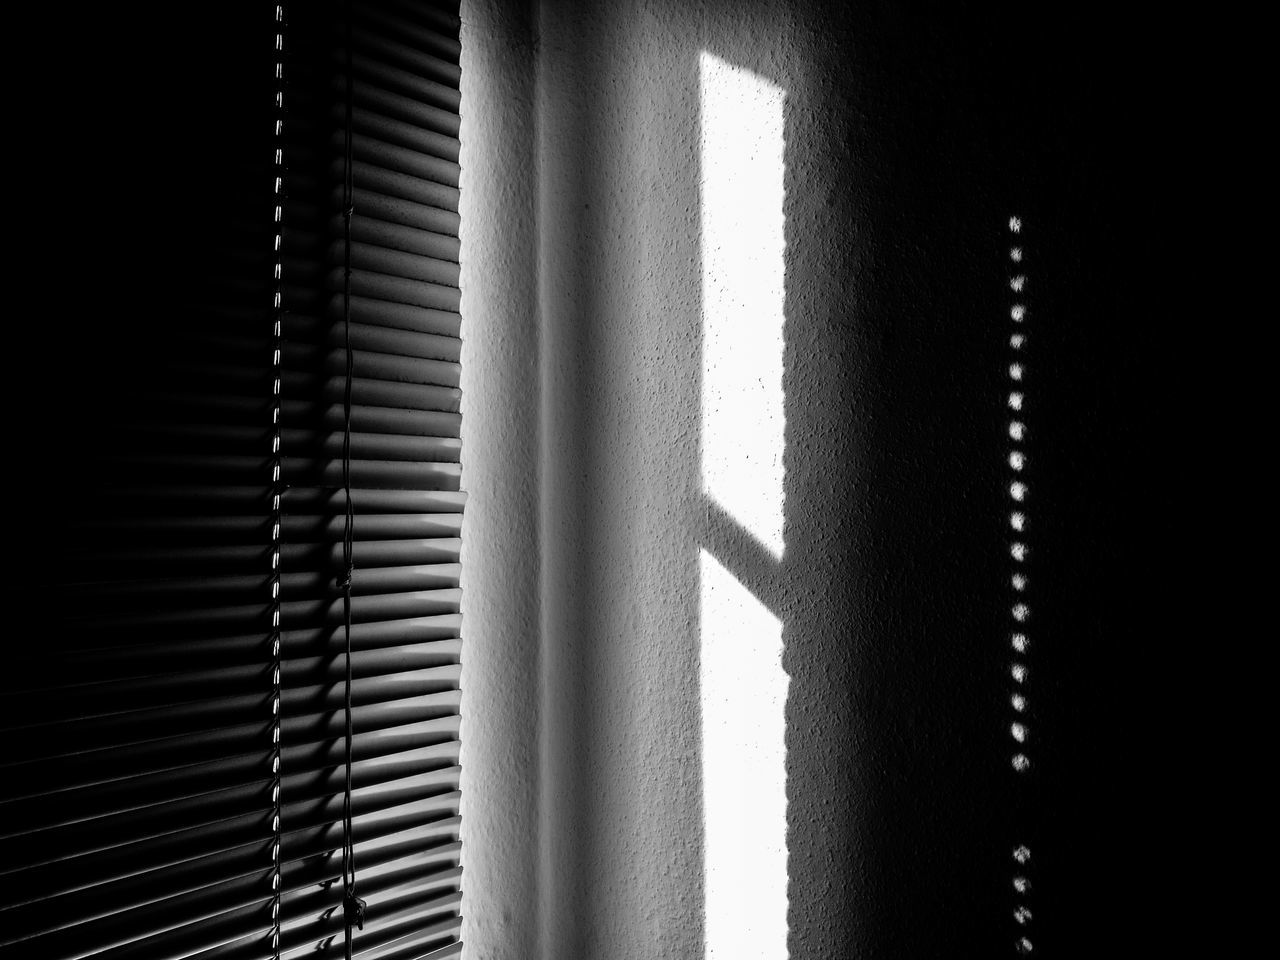 Shadowonthewall Berlin Monochrome Berlin Schwarzweiss Blackandwhite Photography Blinds Day Home Interior Huawei Monochrome HuaweiP9 Huaweiphotography Indoors  Light And Shadow Monochrome No People Schwarzweiß Shadow Shadow And Light Shadowplay Sunlight Window